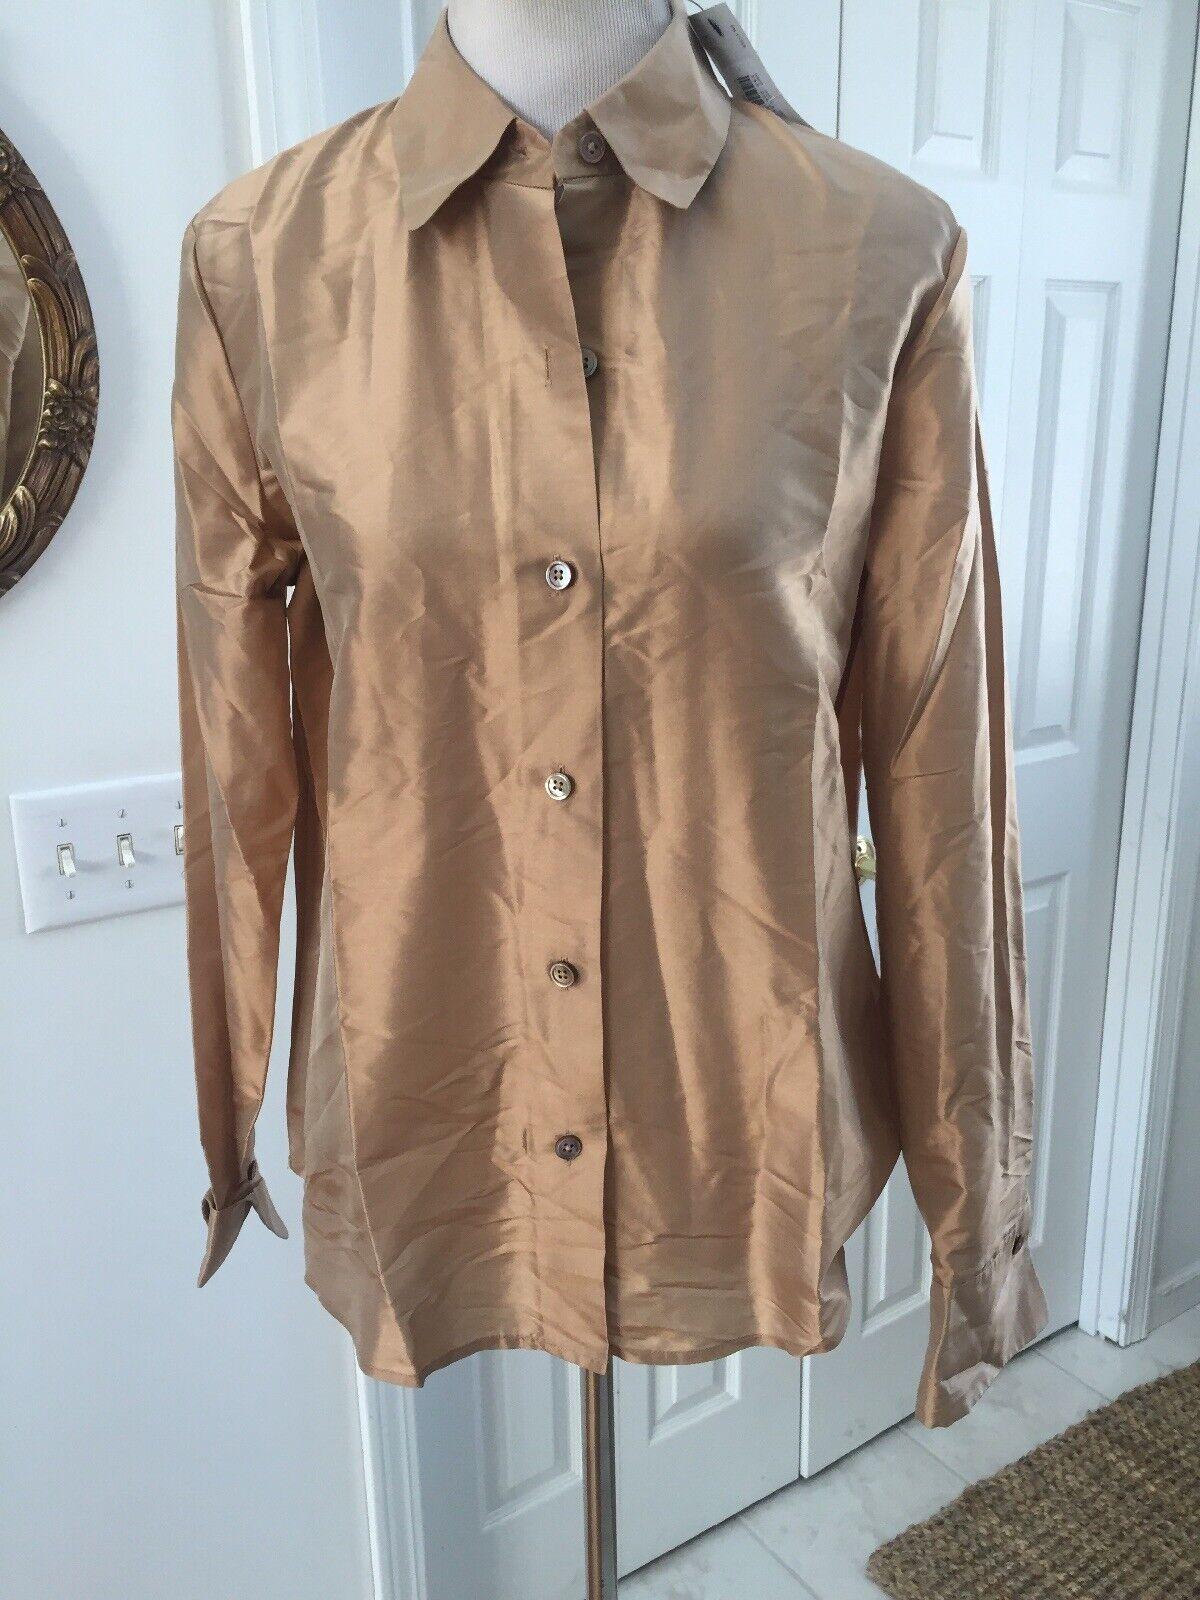 NWT  Ellen Tracy Linda Allard Gold Silk Blouse oben Hemd 10